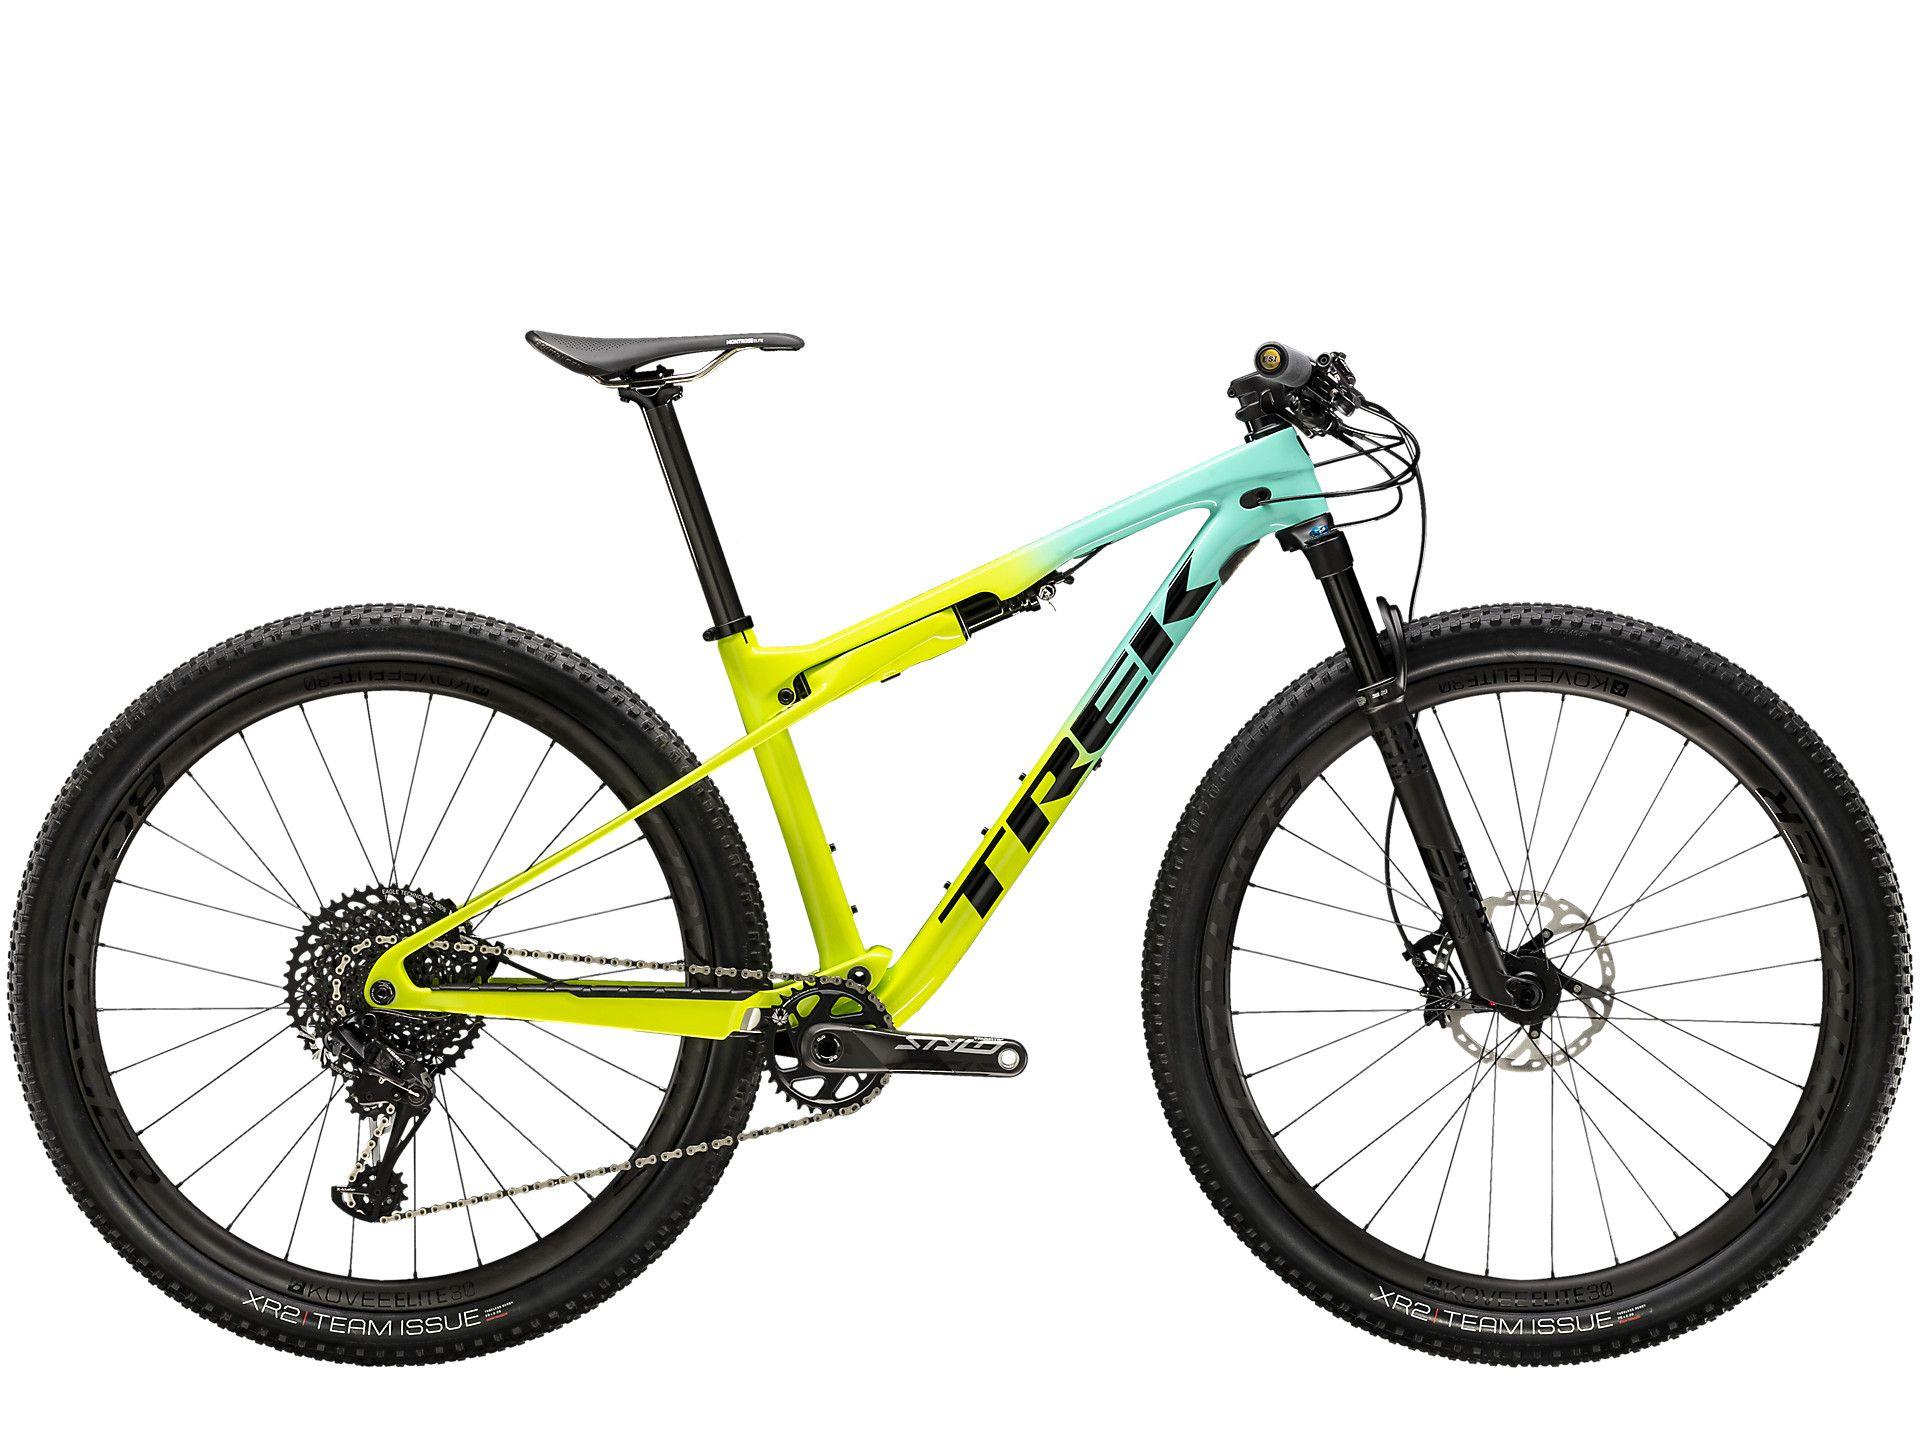 Trek Supercaliber 2020 In 2020 Cross Country Mountain Bike Trek Bikes Trek Mountain Bike